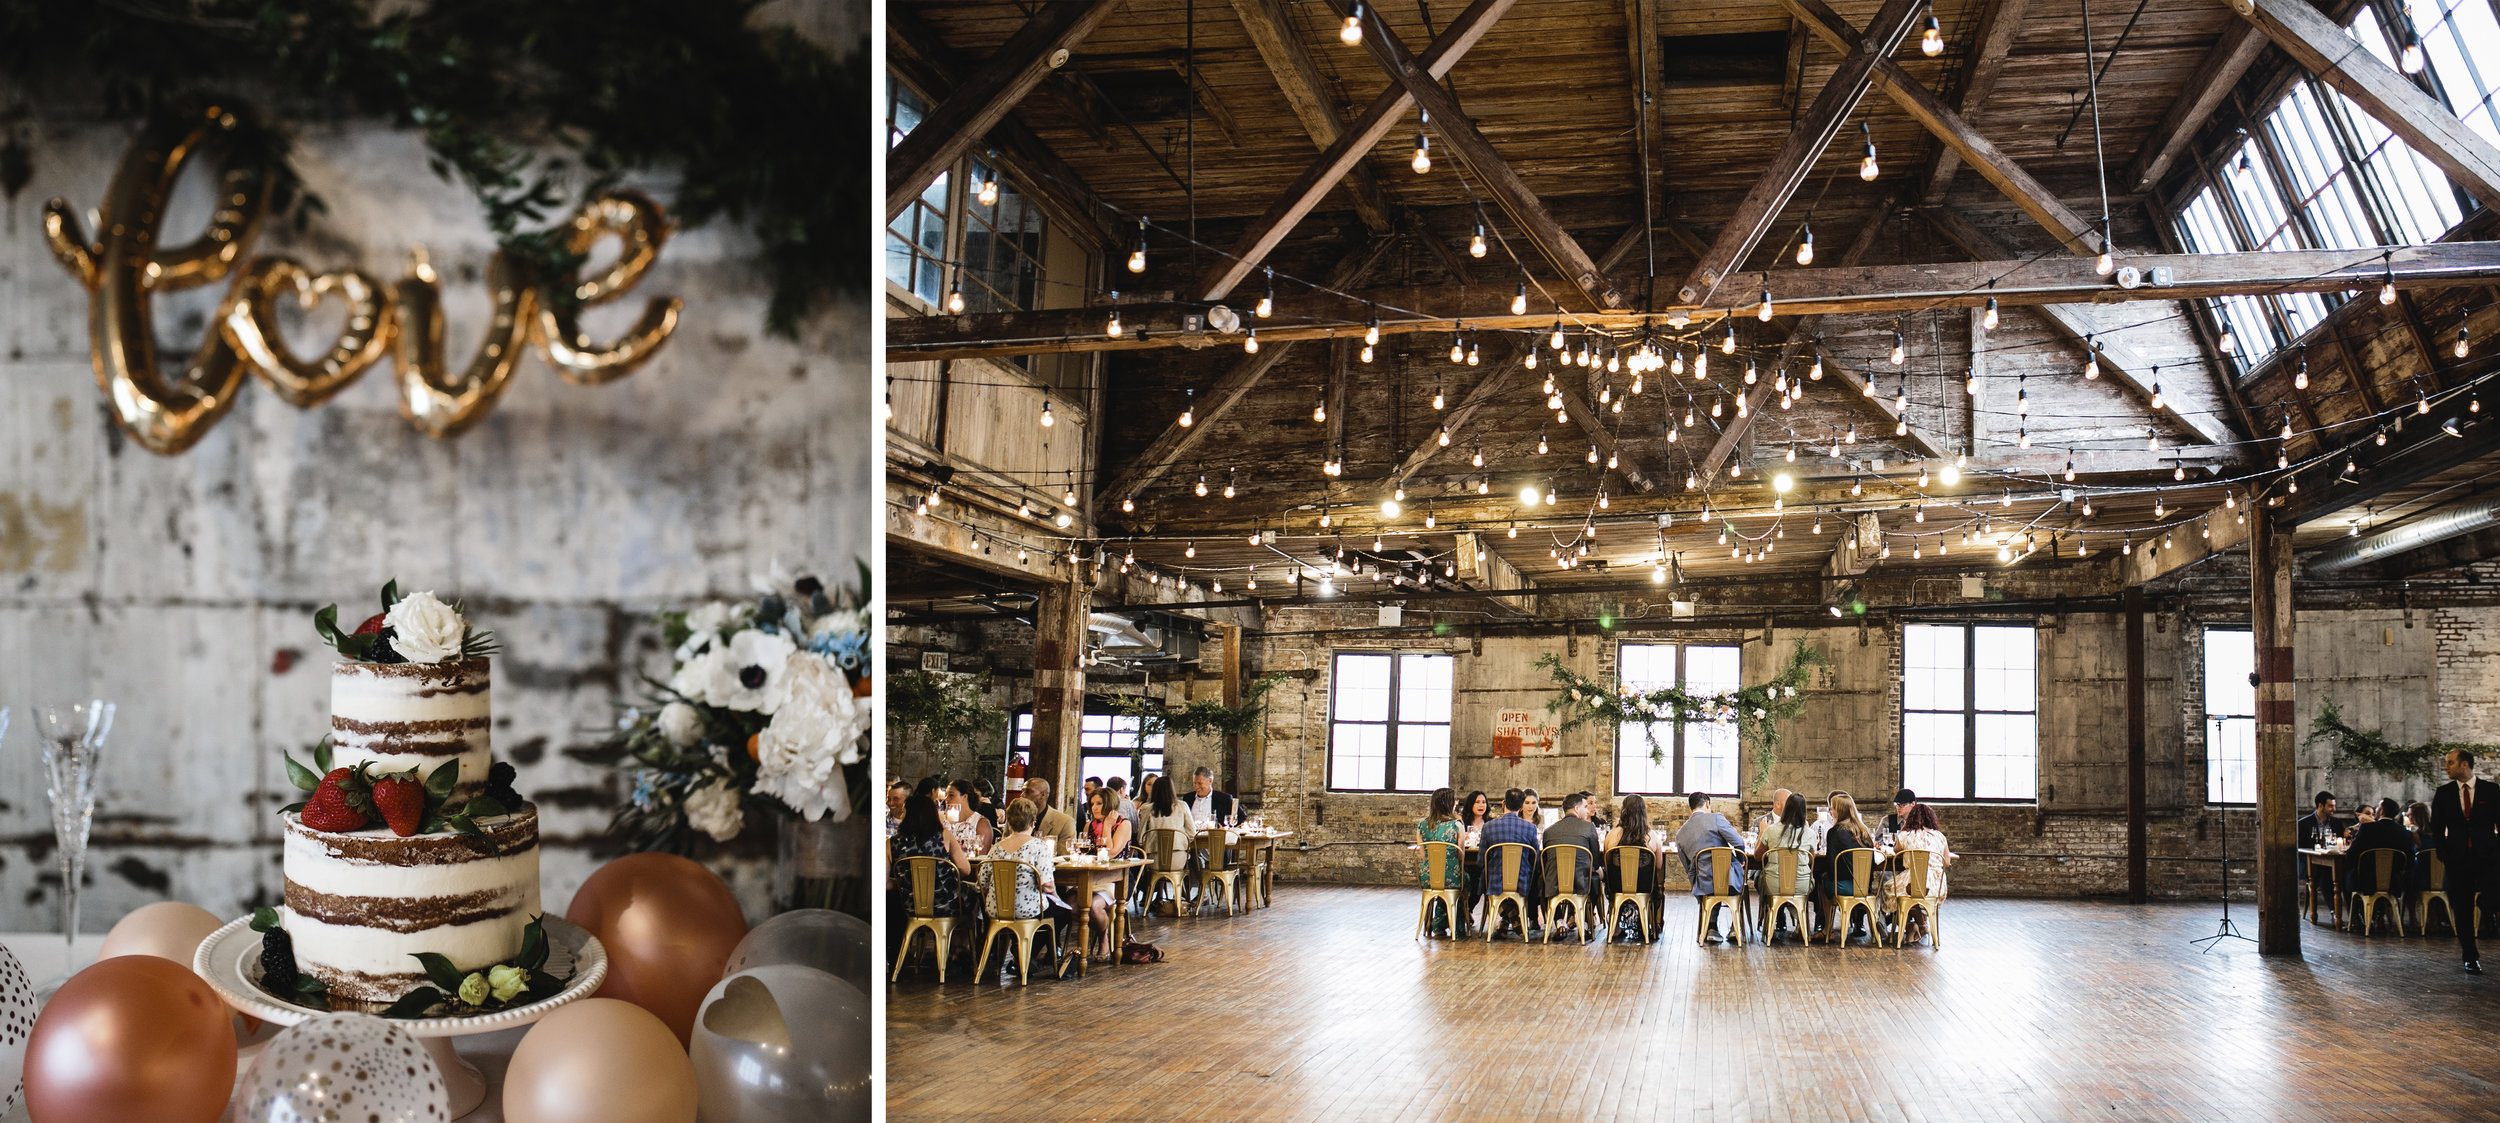 celestehernandez - nyc-wedding024.jpg